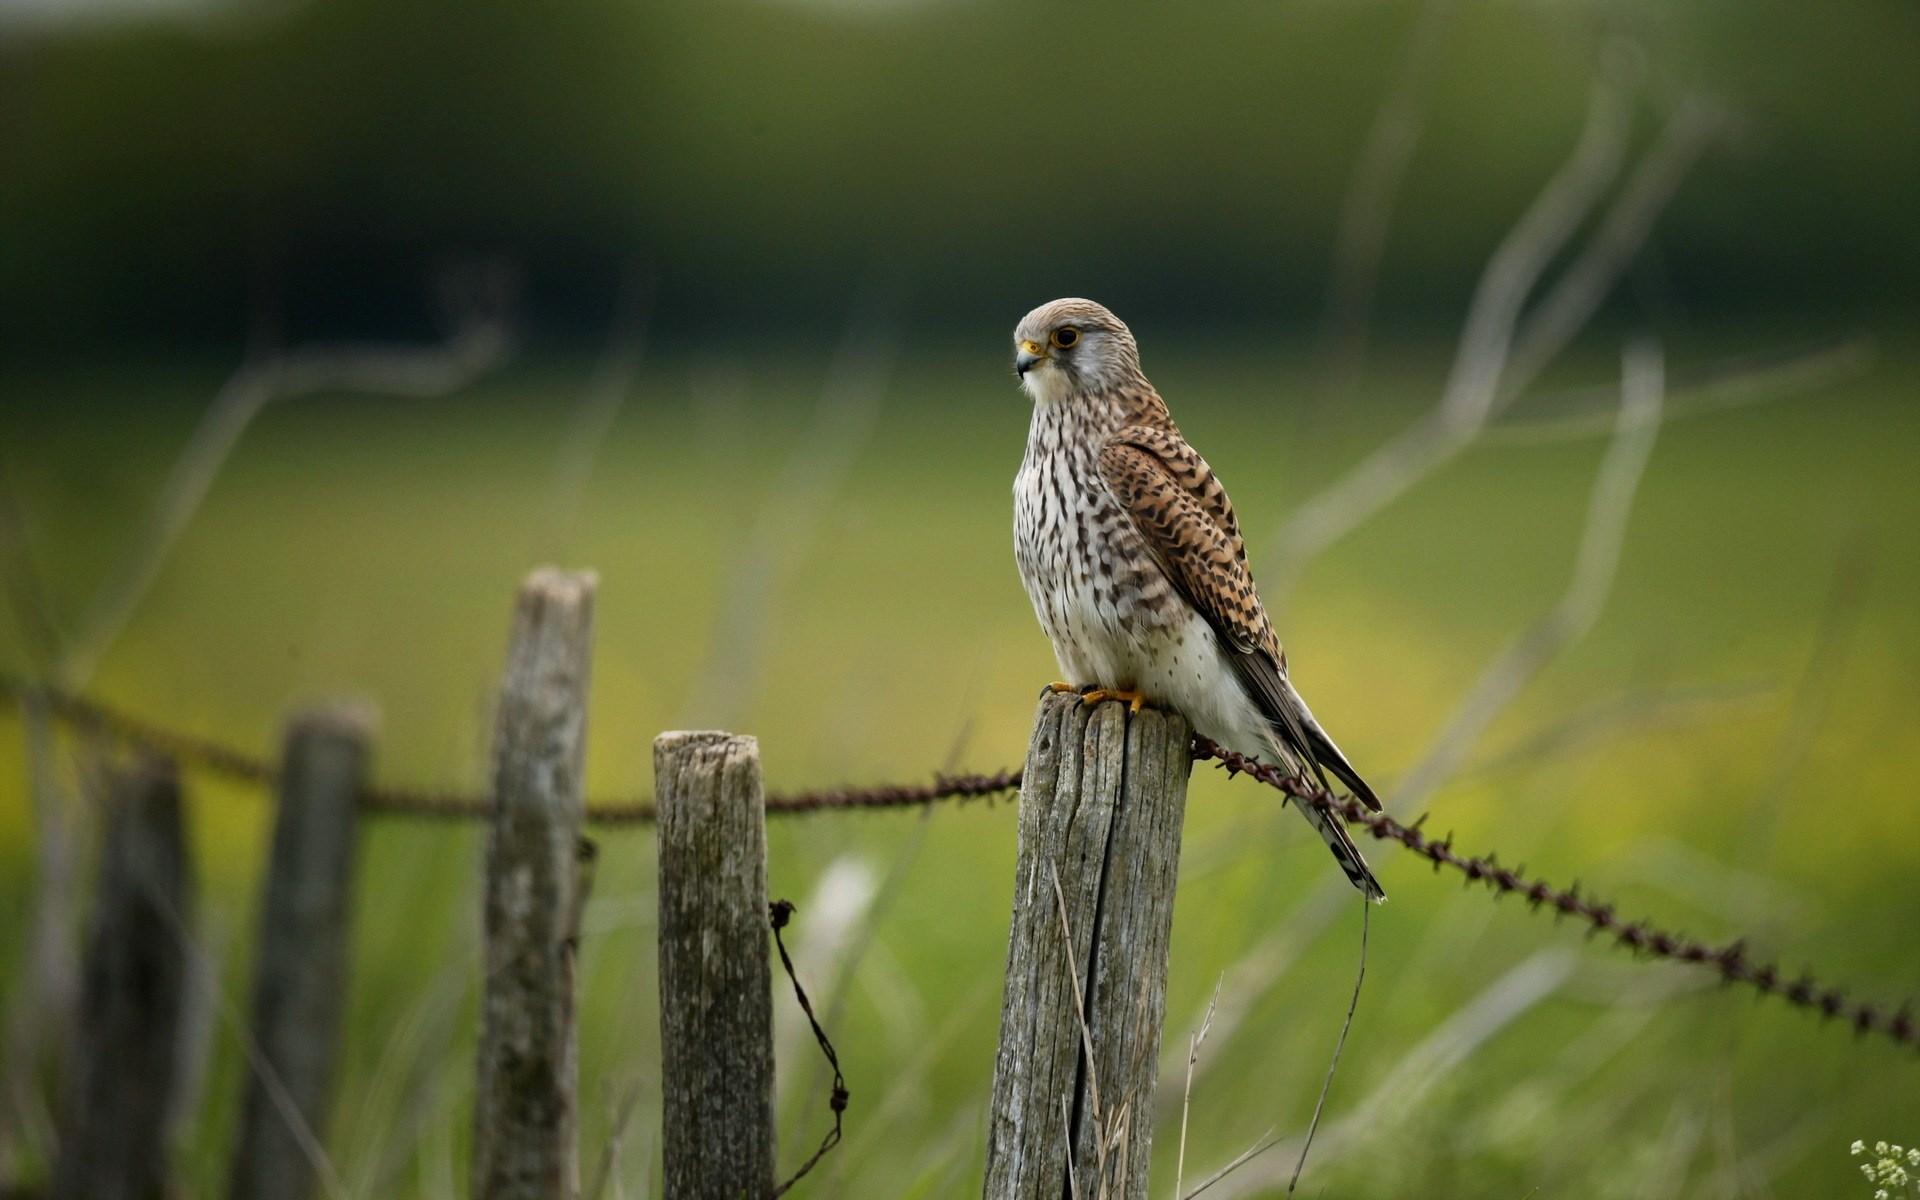 Falcon Bird Fence Nature